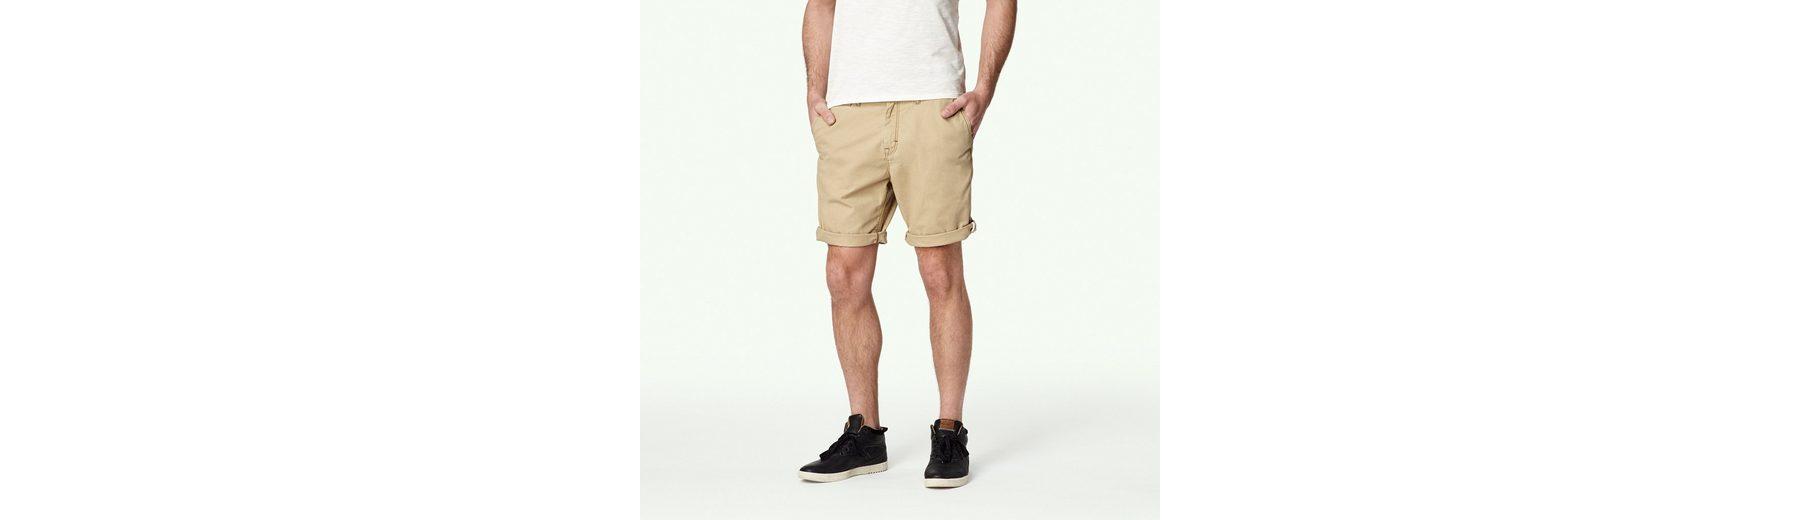 O'Neill Walkshorts Friday night chino shorts